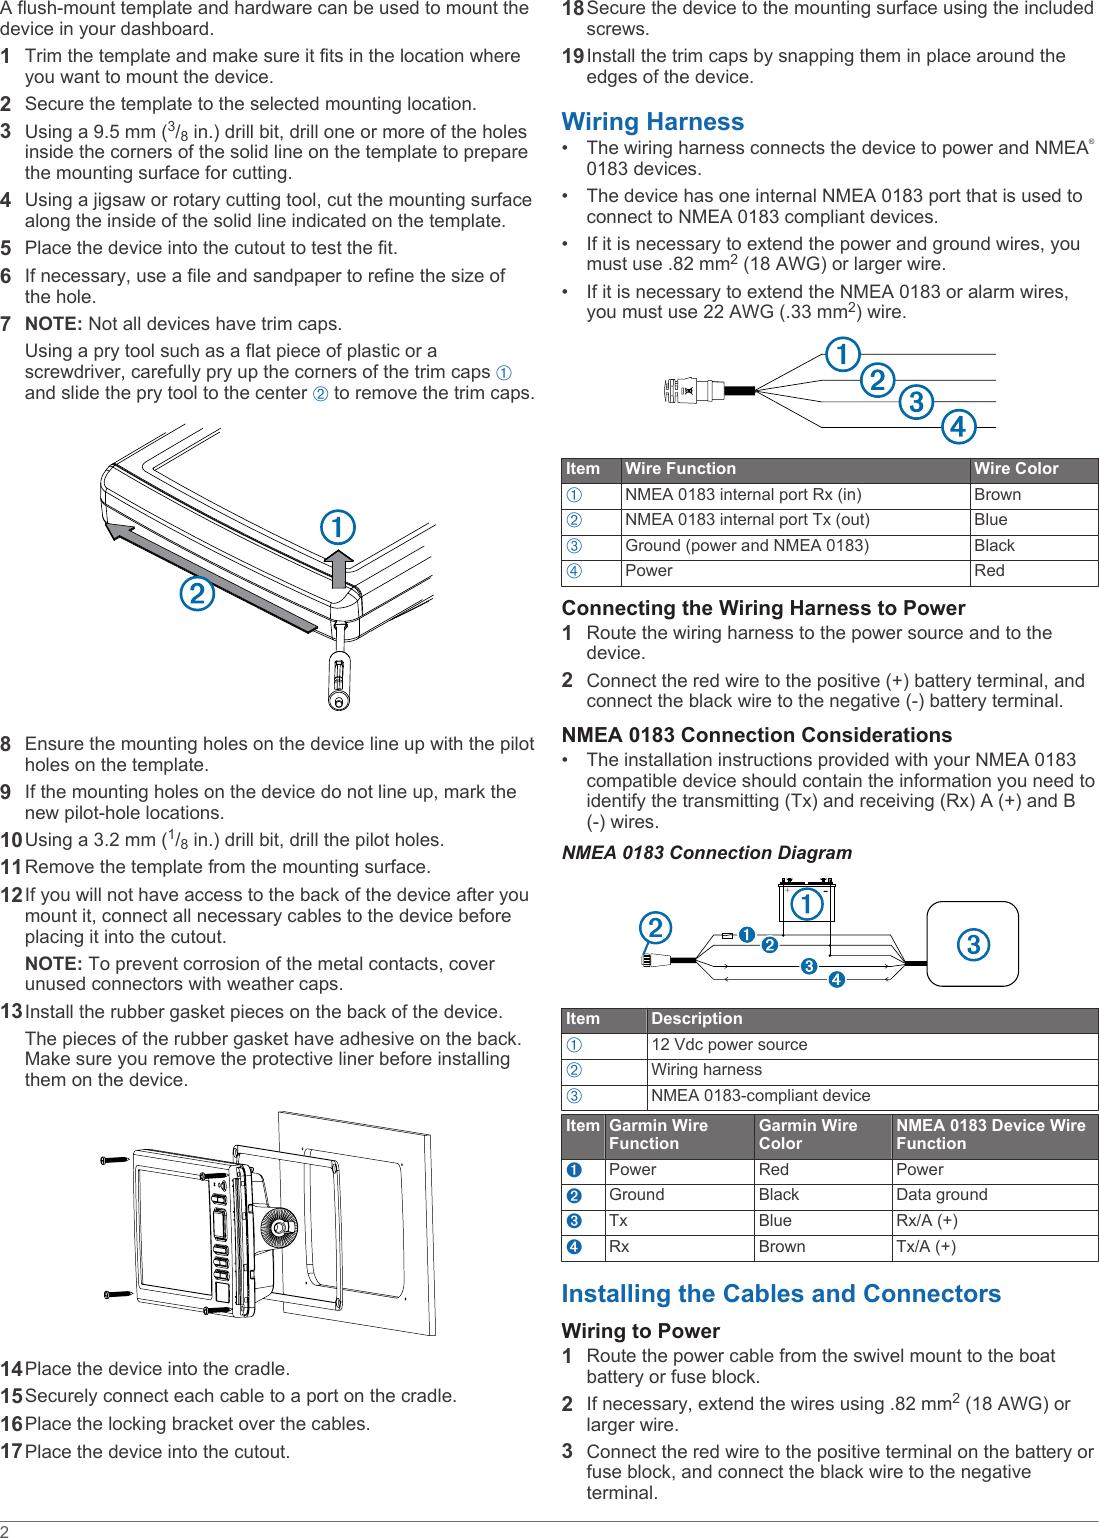 hight resolution of garmin nmea 0183 wiring diagram